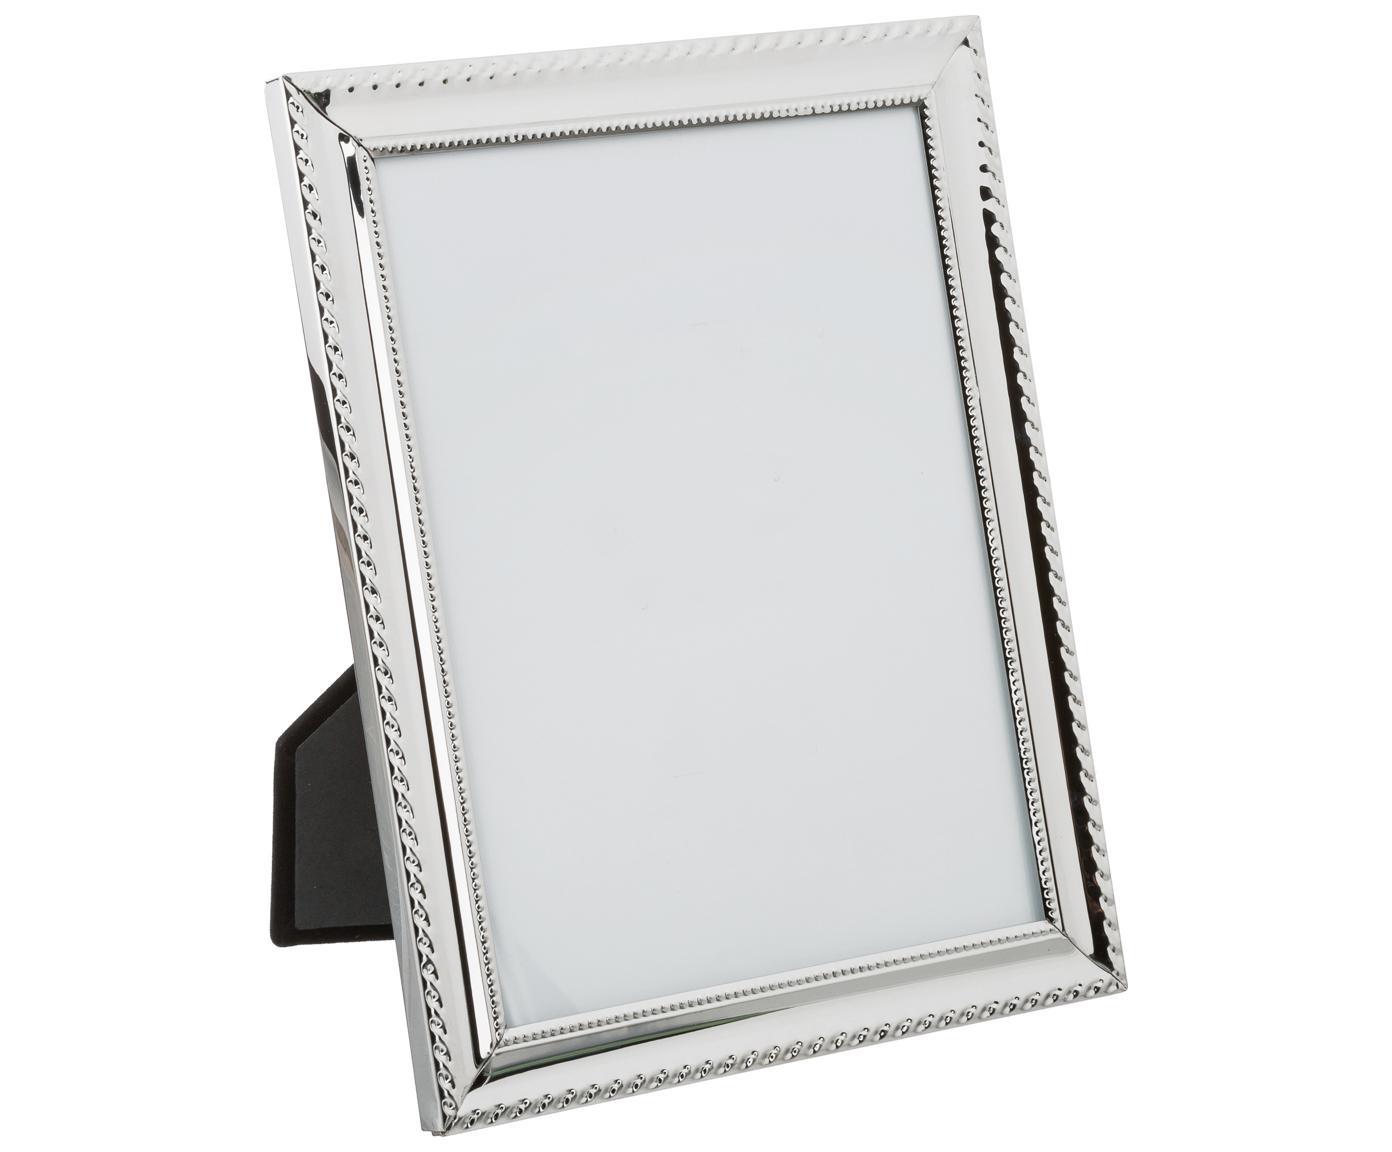 Fotolijst Julie, Frame: metaal, Zilverkleurig, transparant, 15 x 20 cm